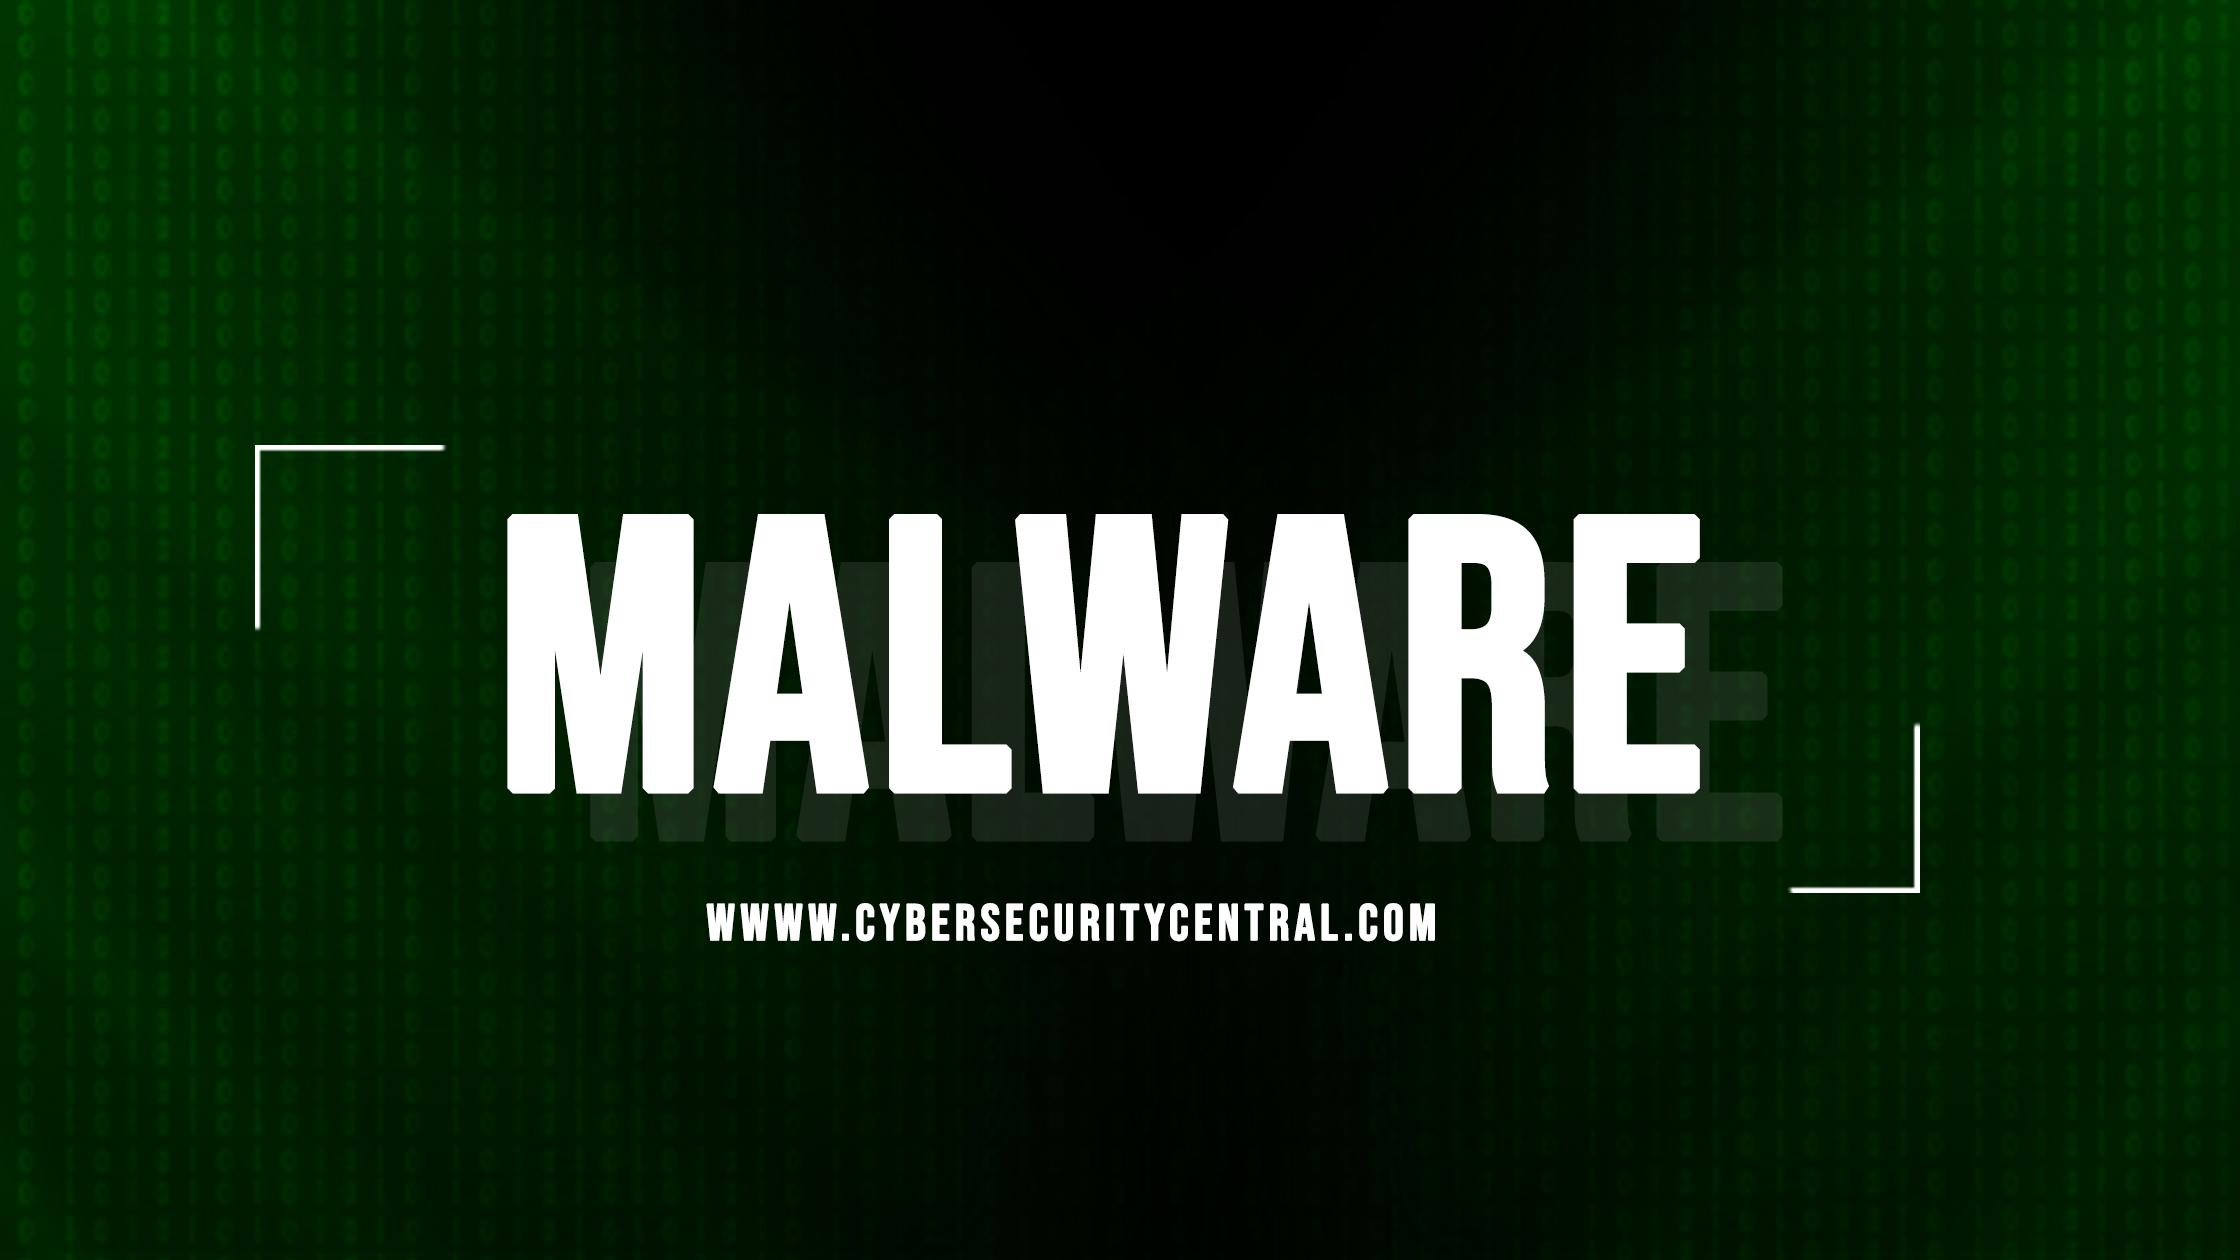 Malware, privacy, virus, cybercriminals